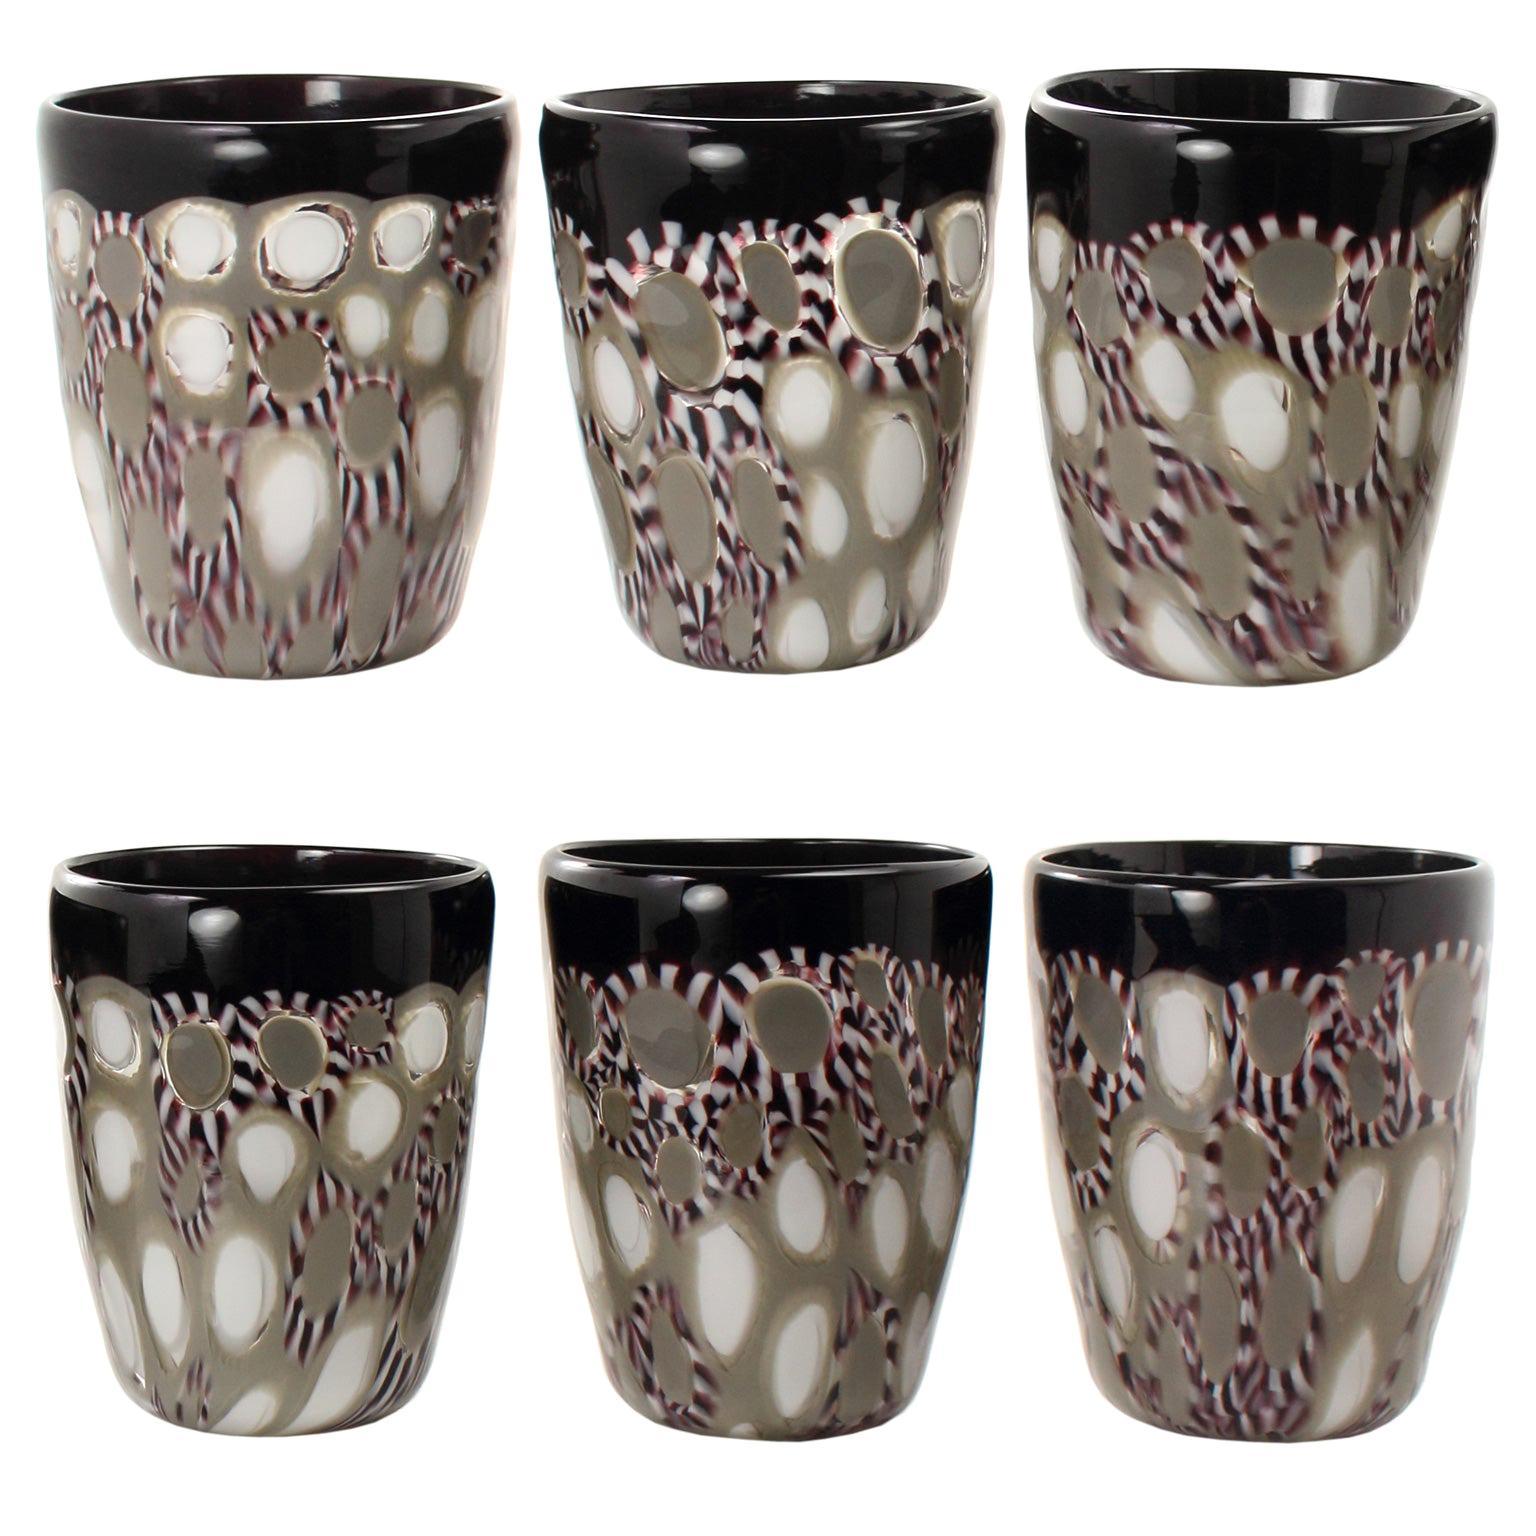 Set of 6 Artistic Handmade Glasses Murano White Black Glass by Multiforme